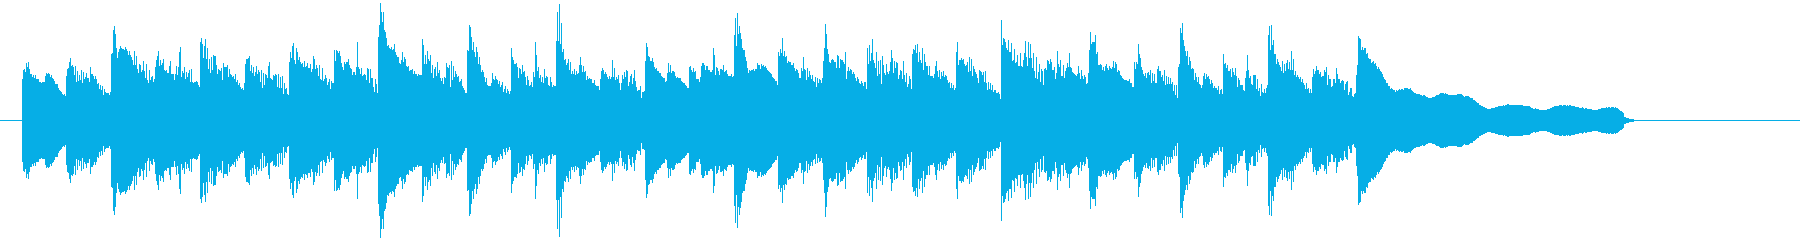 Guitar CM 18の再生済みの波形